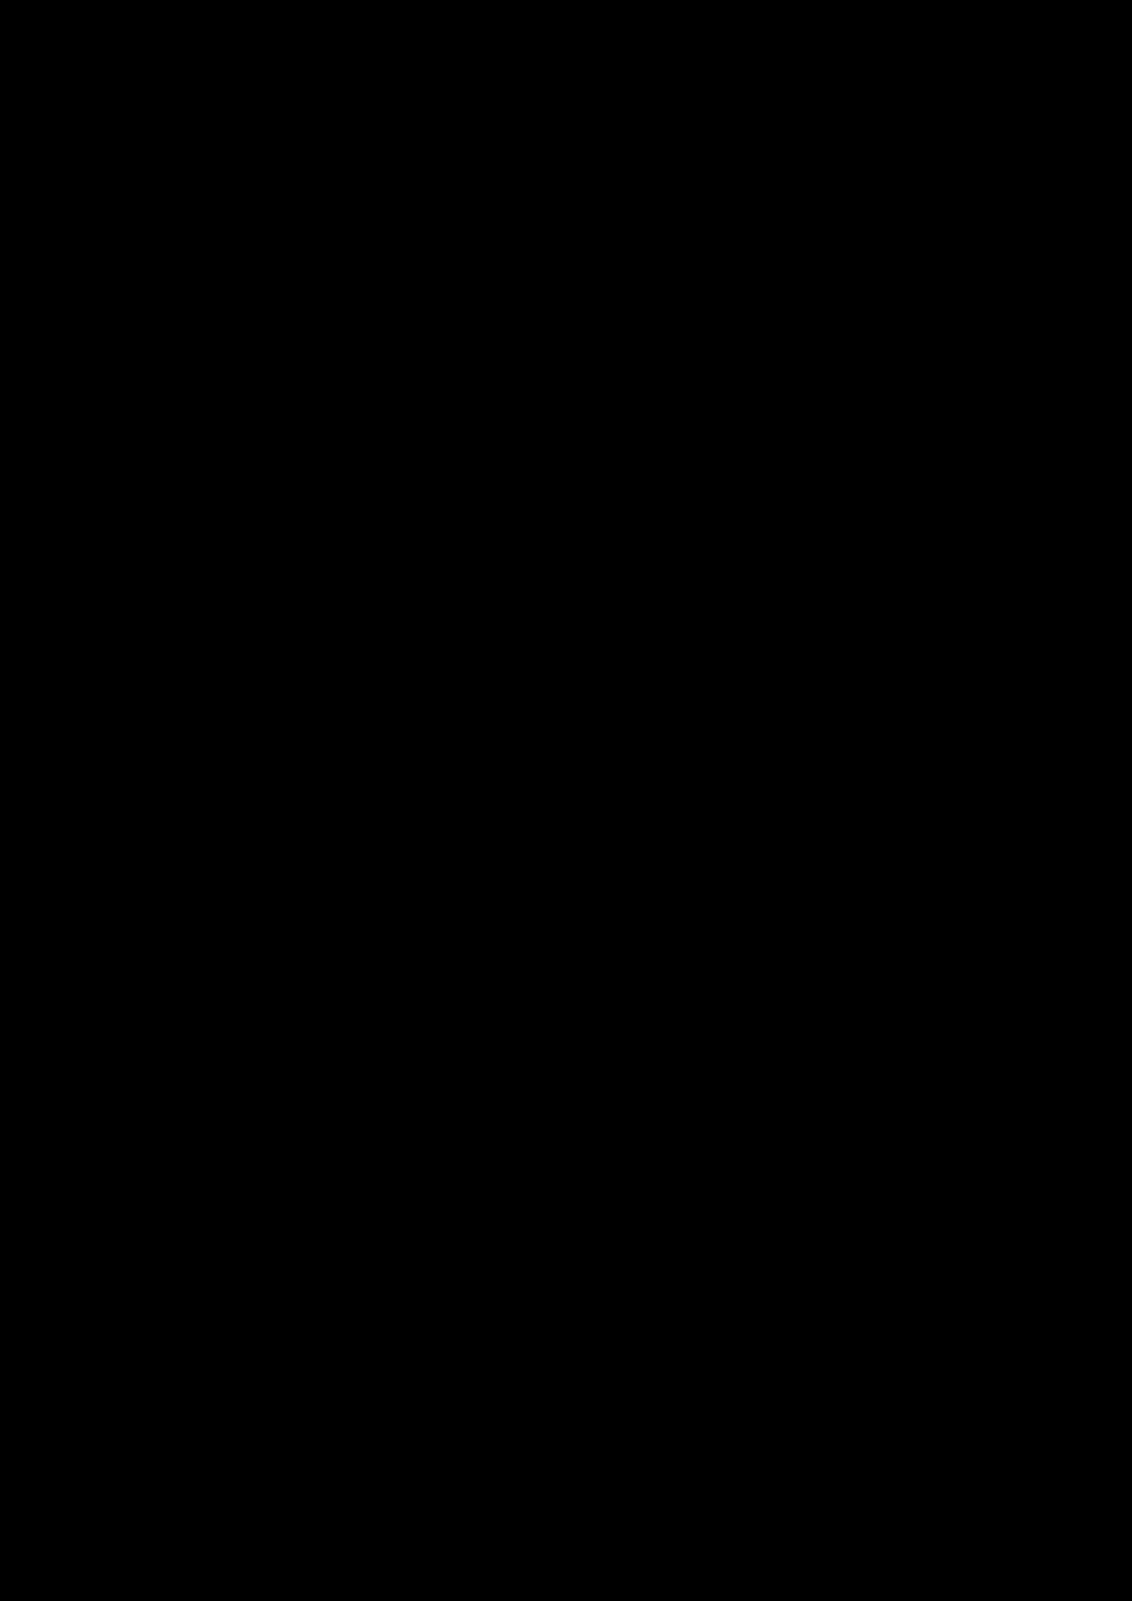 Belyiy sokol slide, Image 143